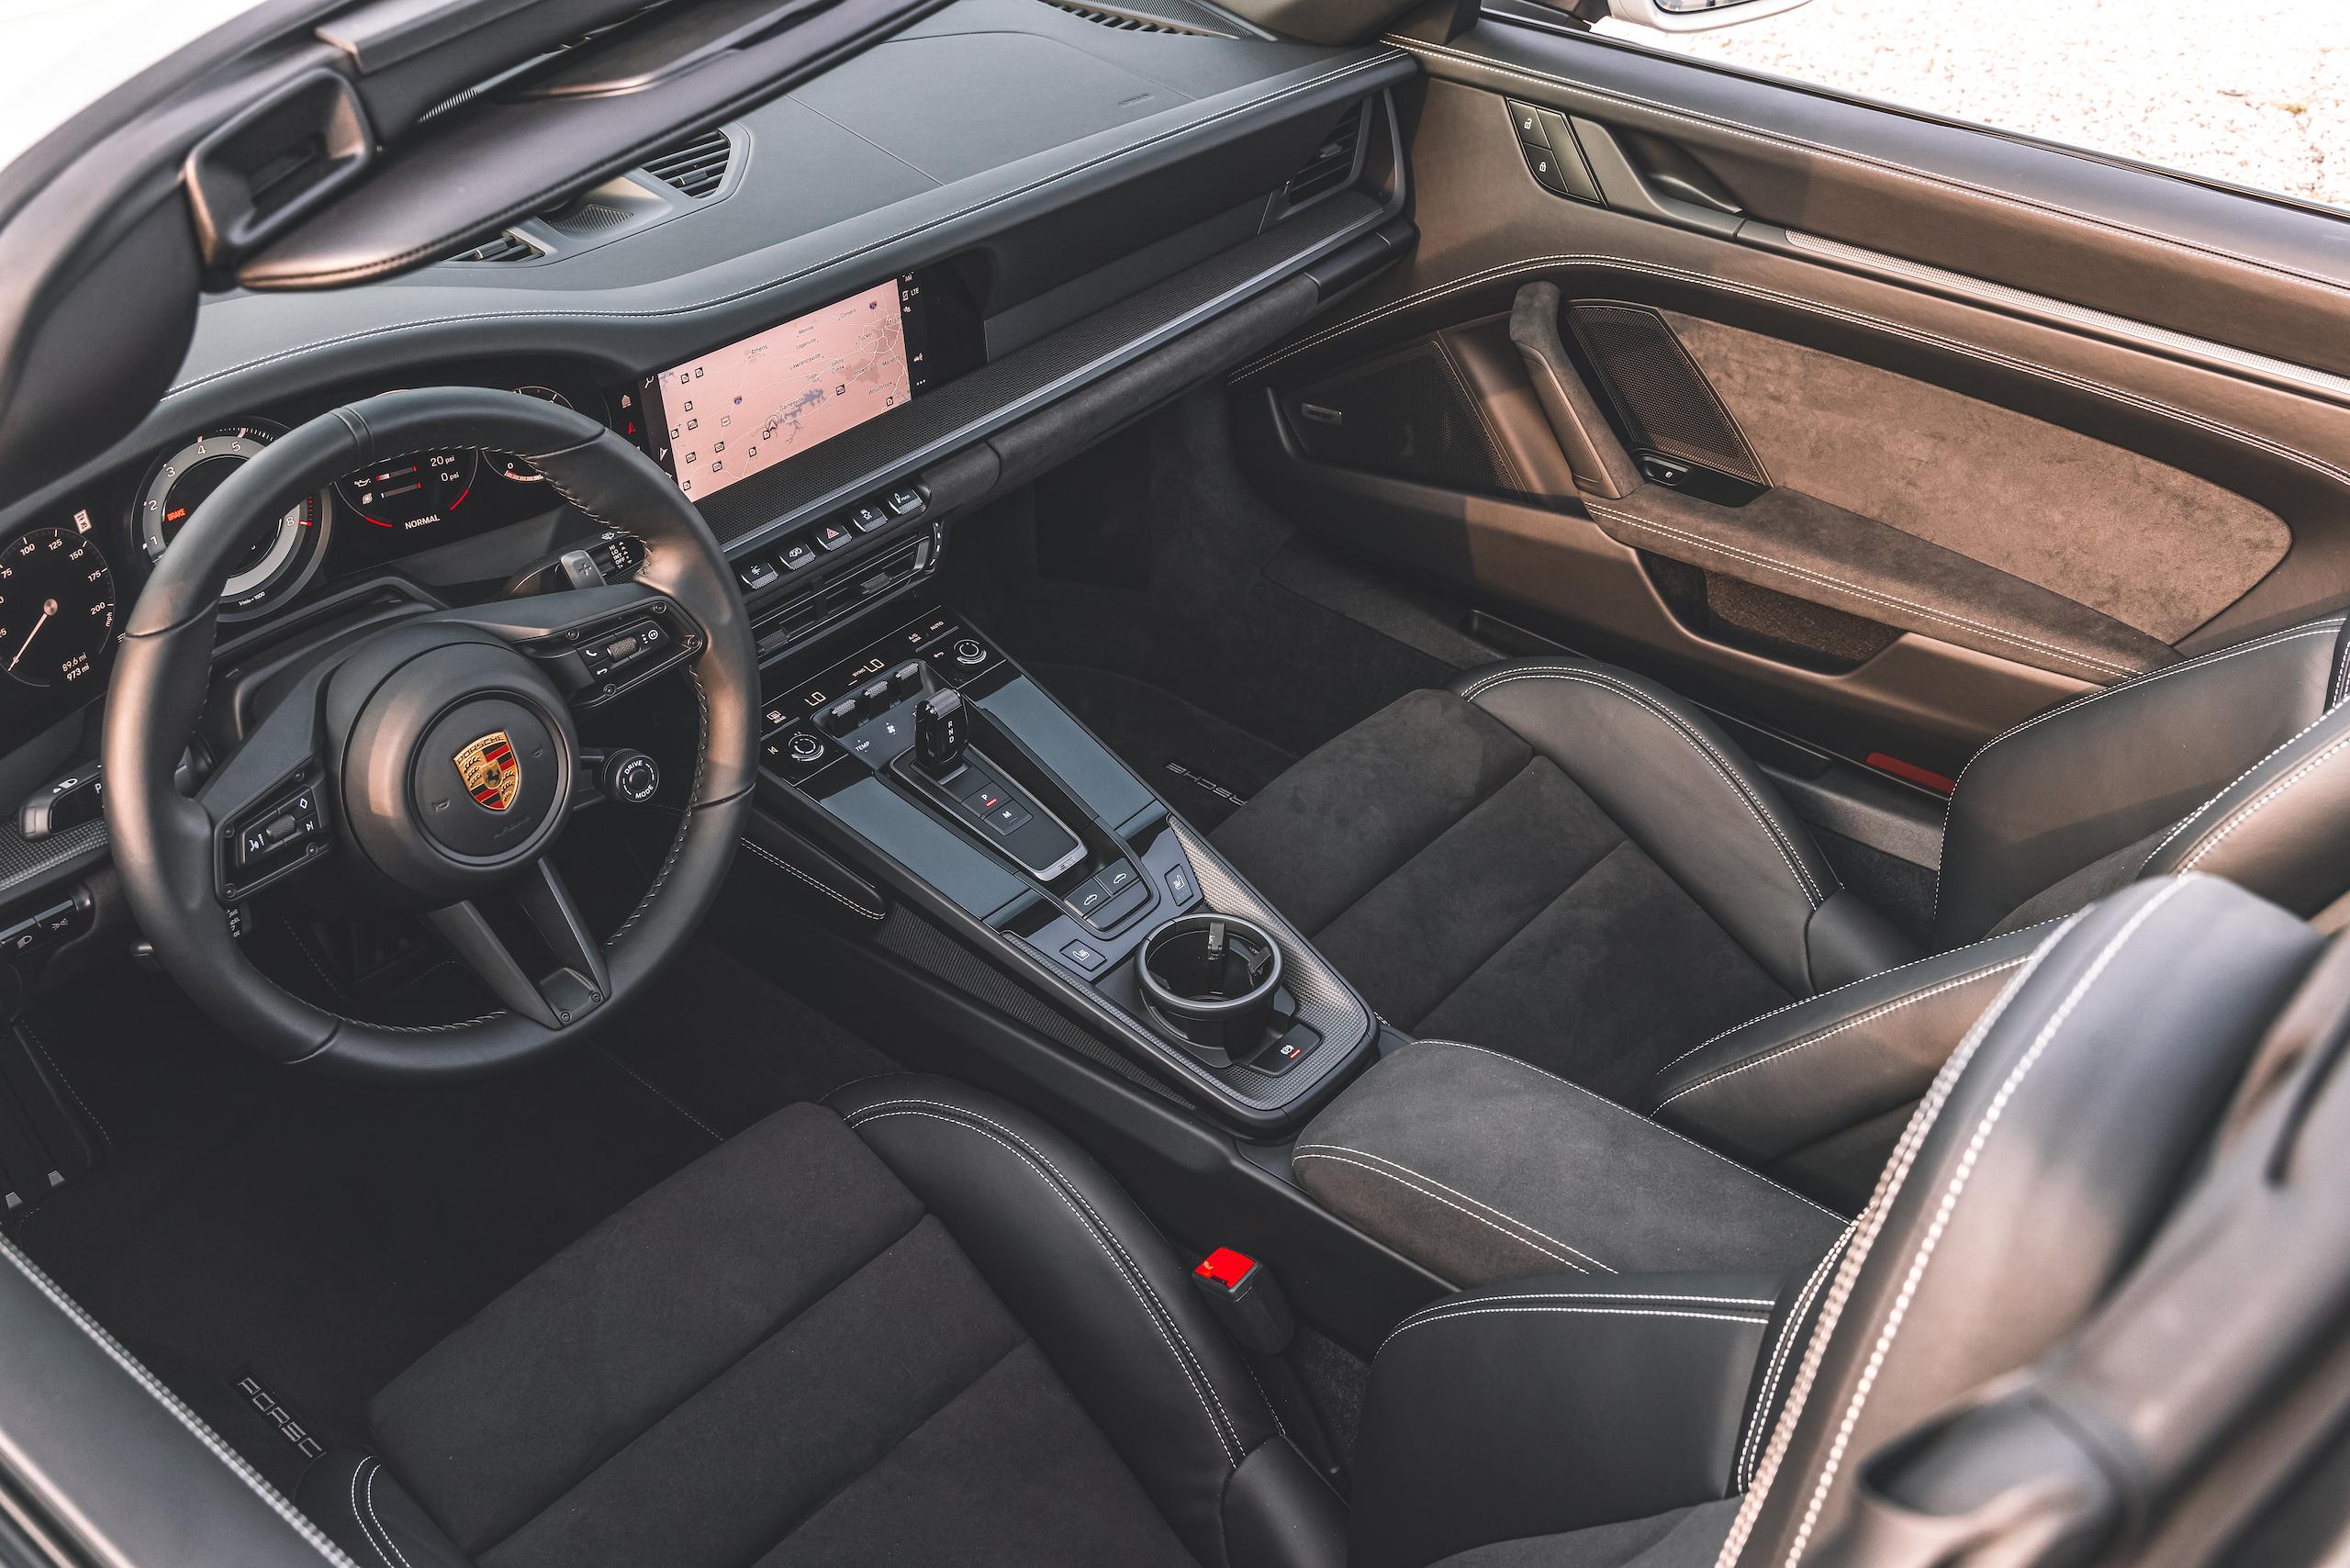 Porsche 911 Targa 4 GTS interior overview